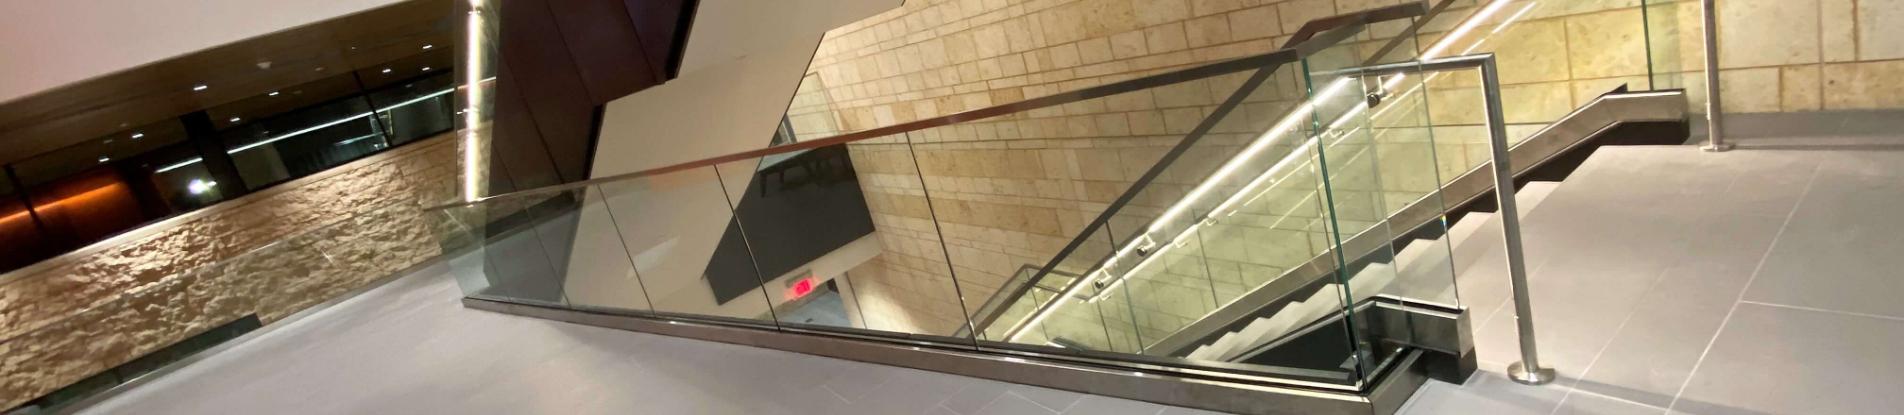 UTPB Engineering Building, TX installs HDI's Optik Shoe with LED